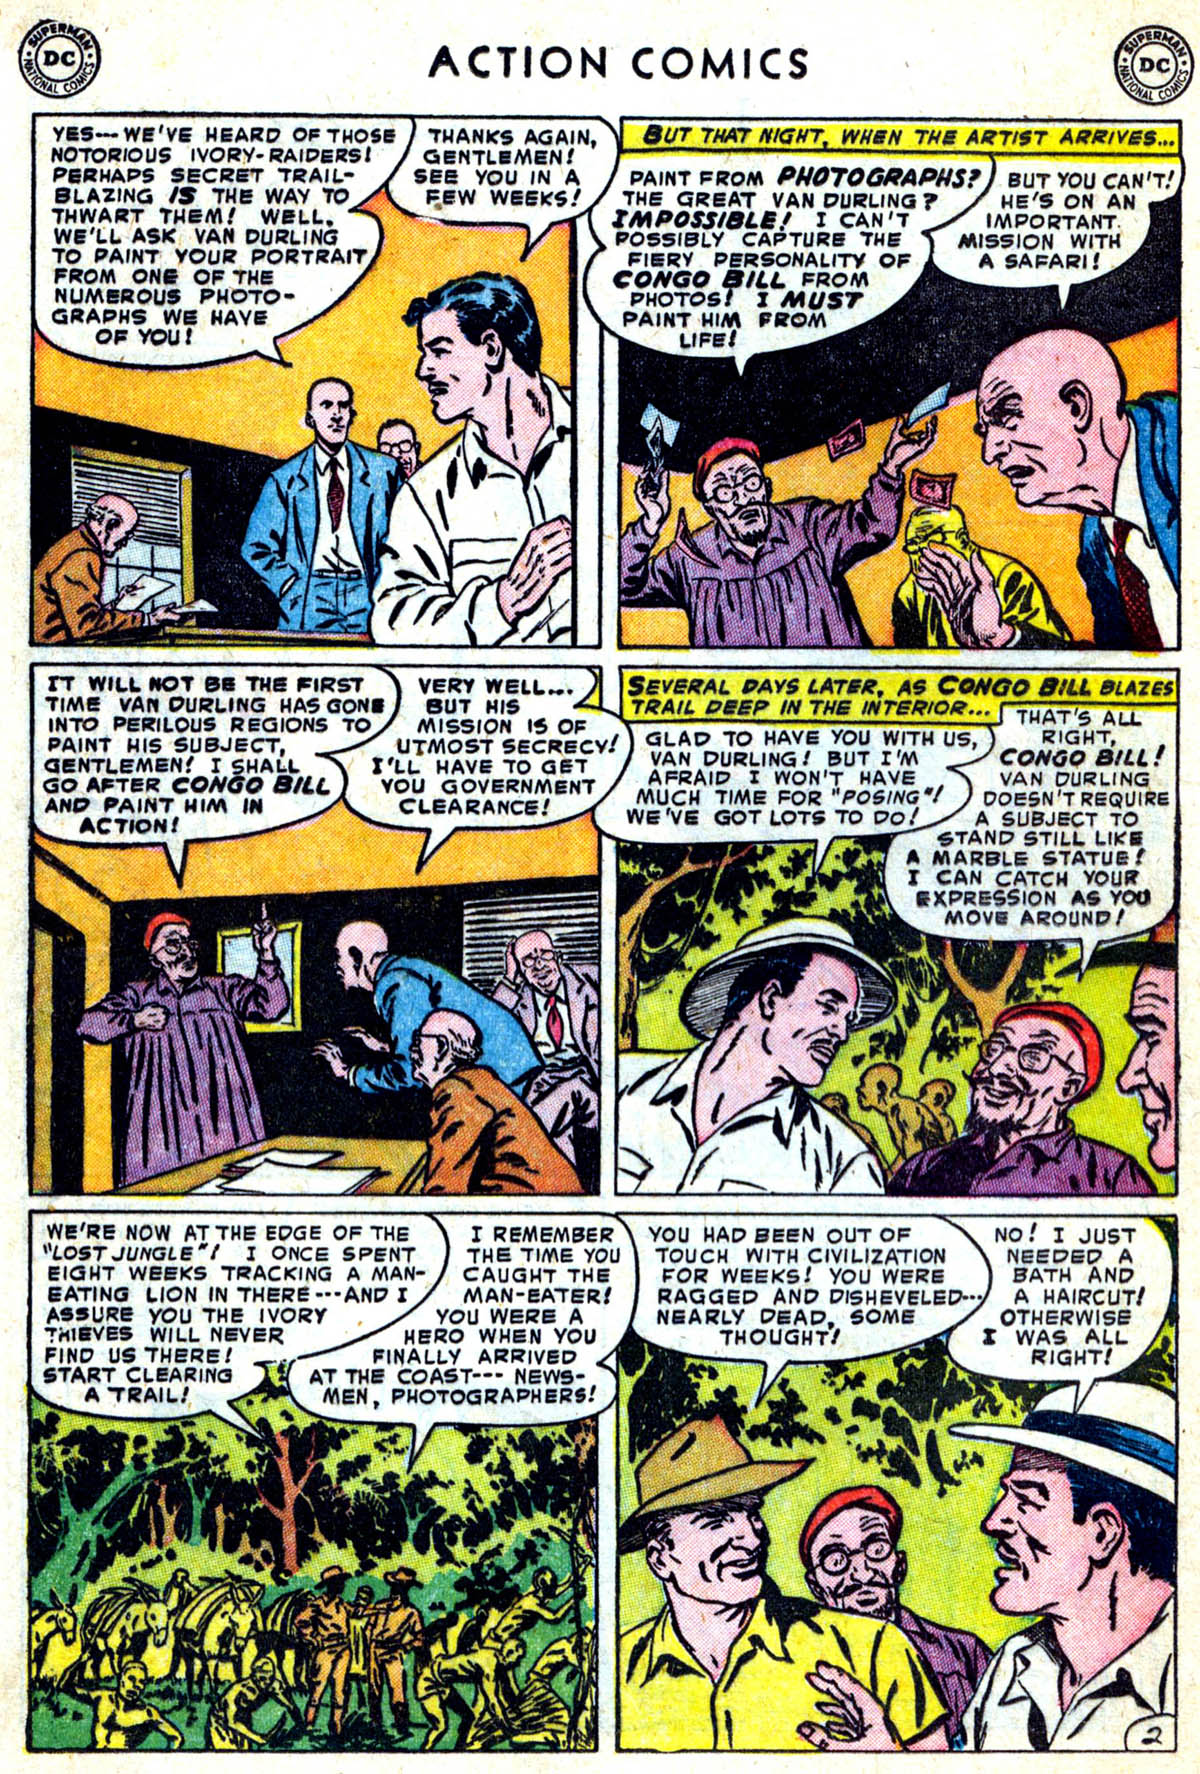 Action Comics (1938) 183 Page 17